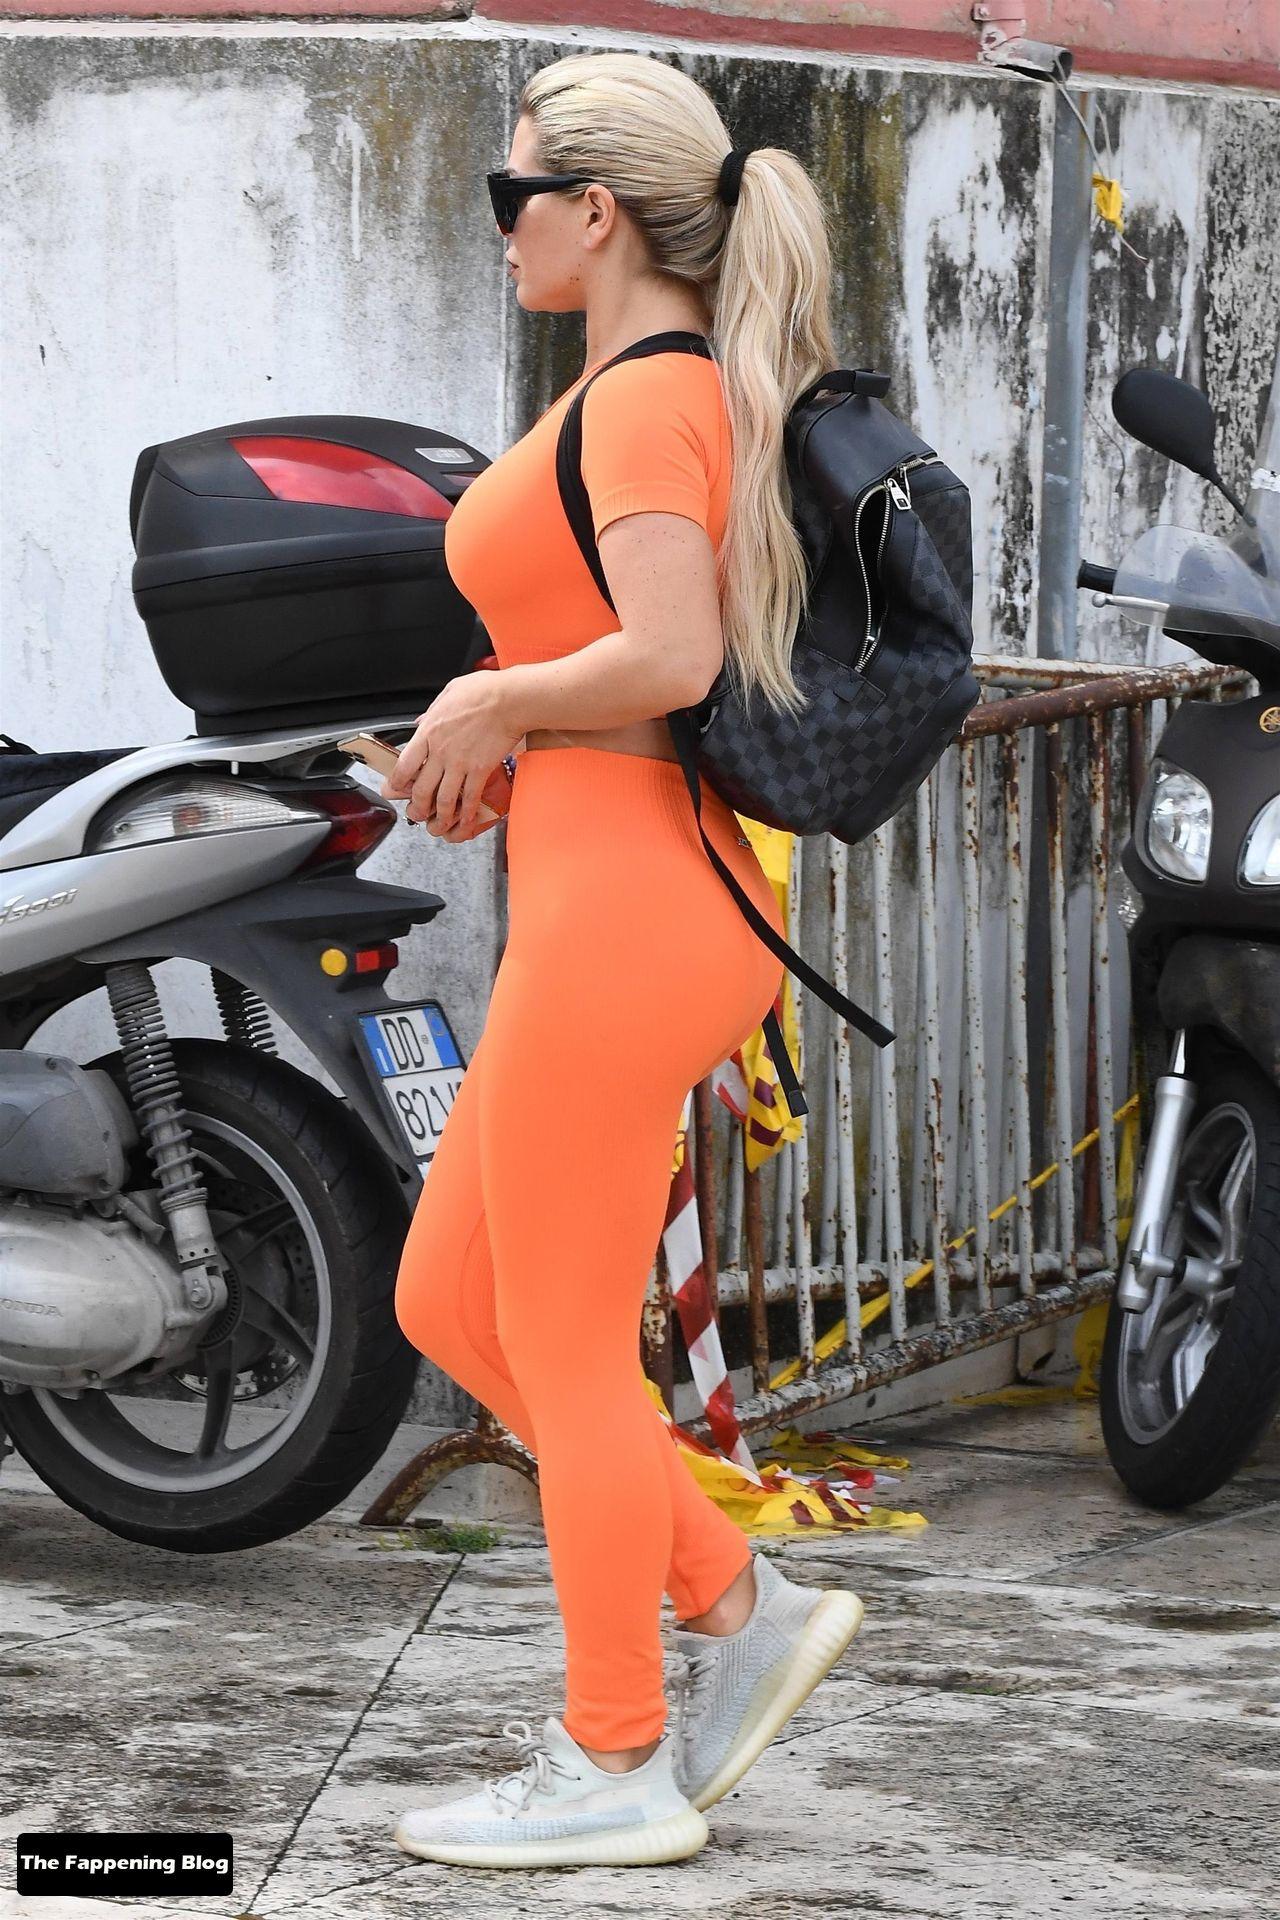 Bianca-Gascoigne-Sexy-The-Fappening-Blog-21.jpg